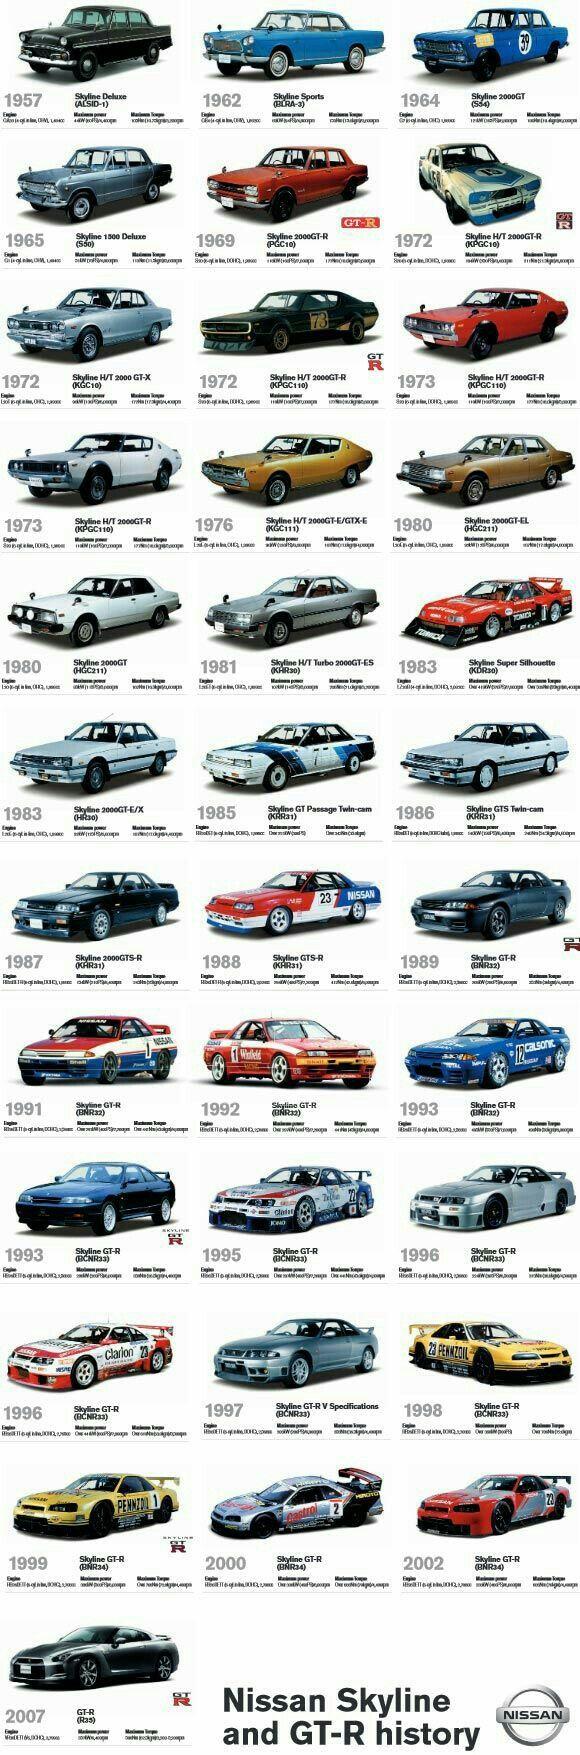 Nissan's Skyland & GT-R's History 1957 - 2007